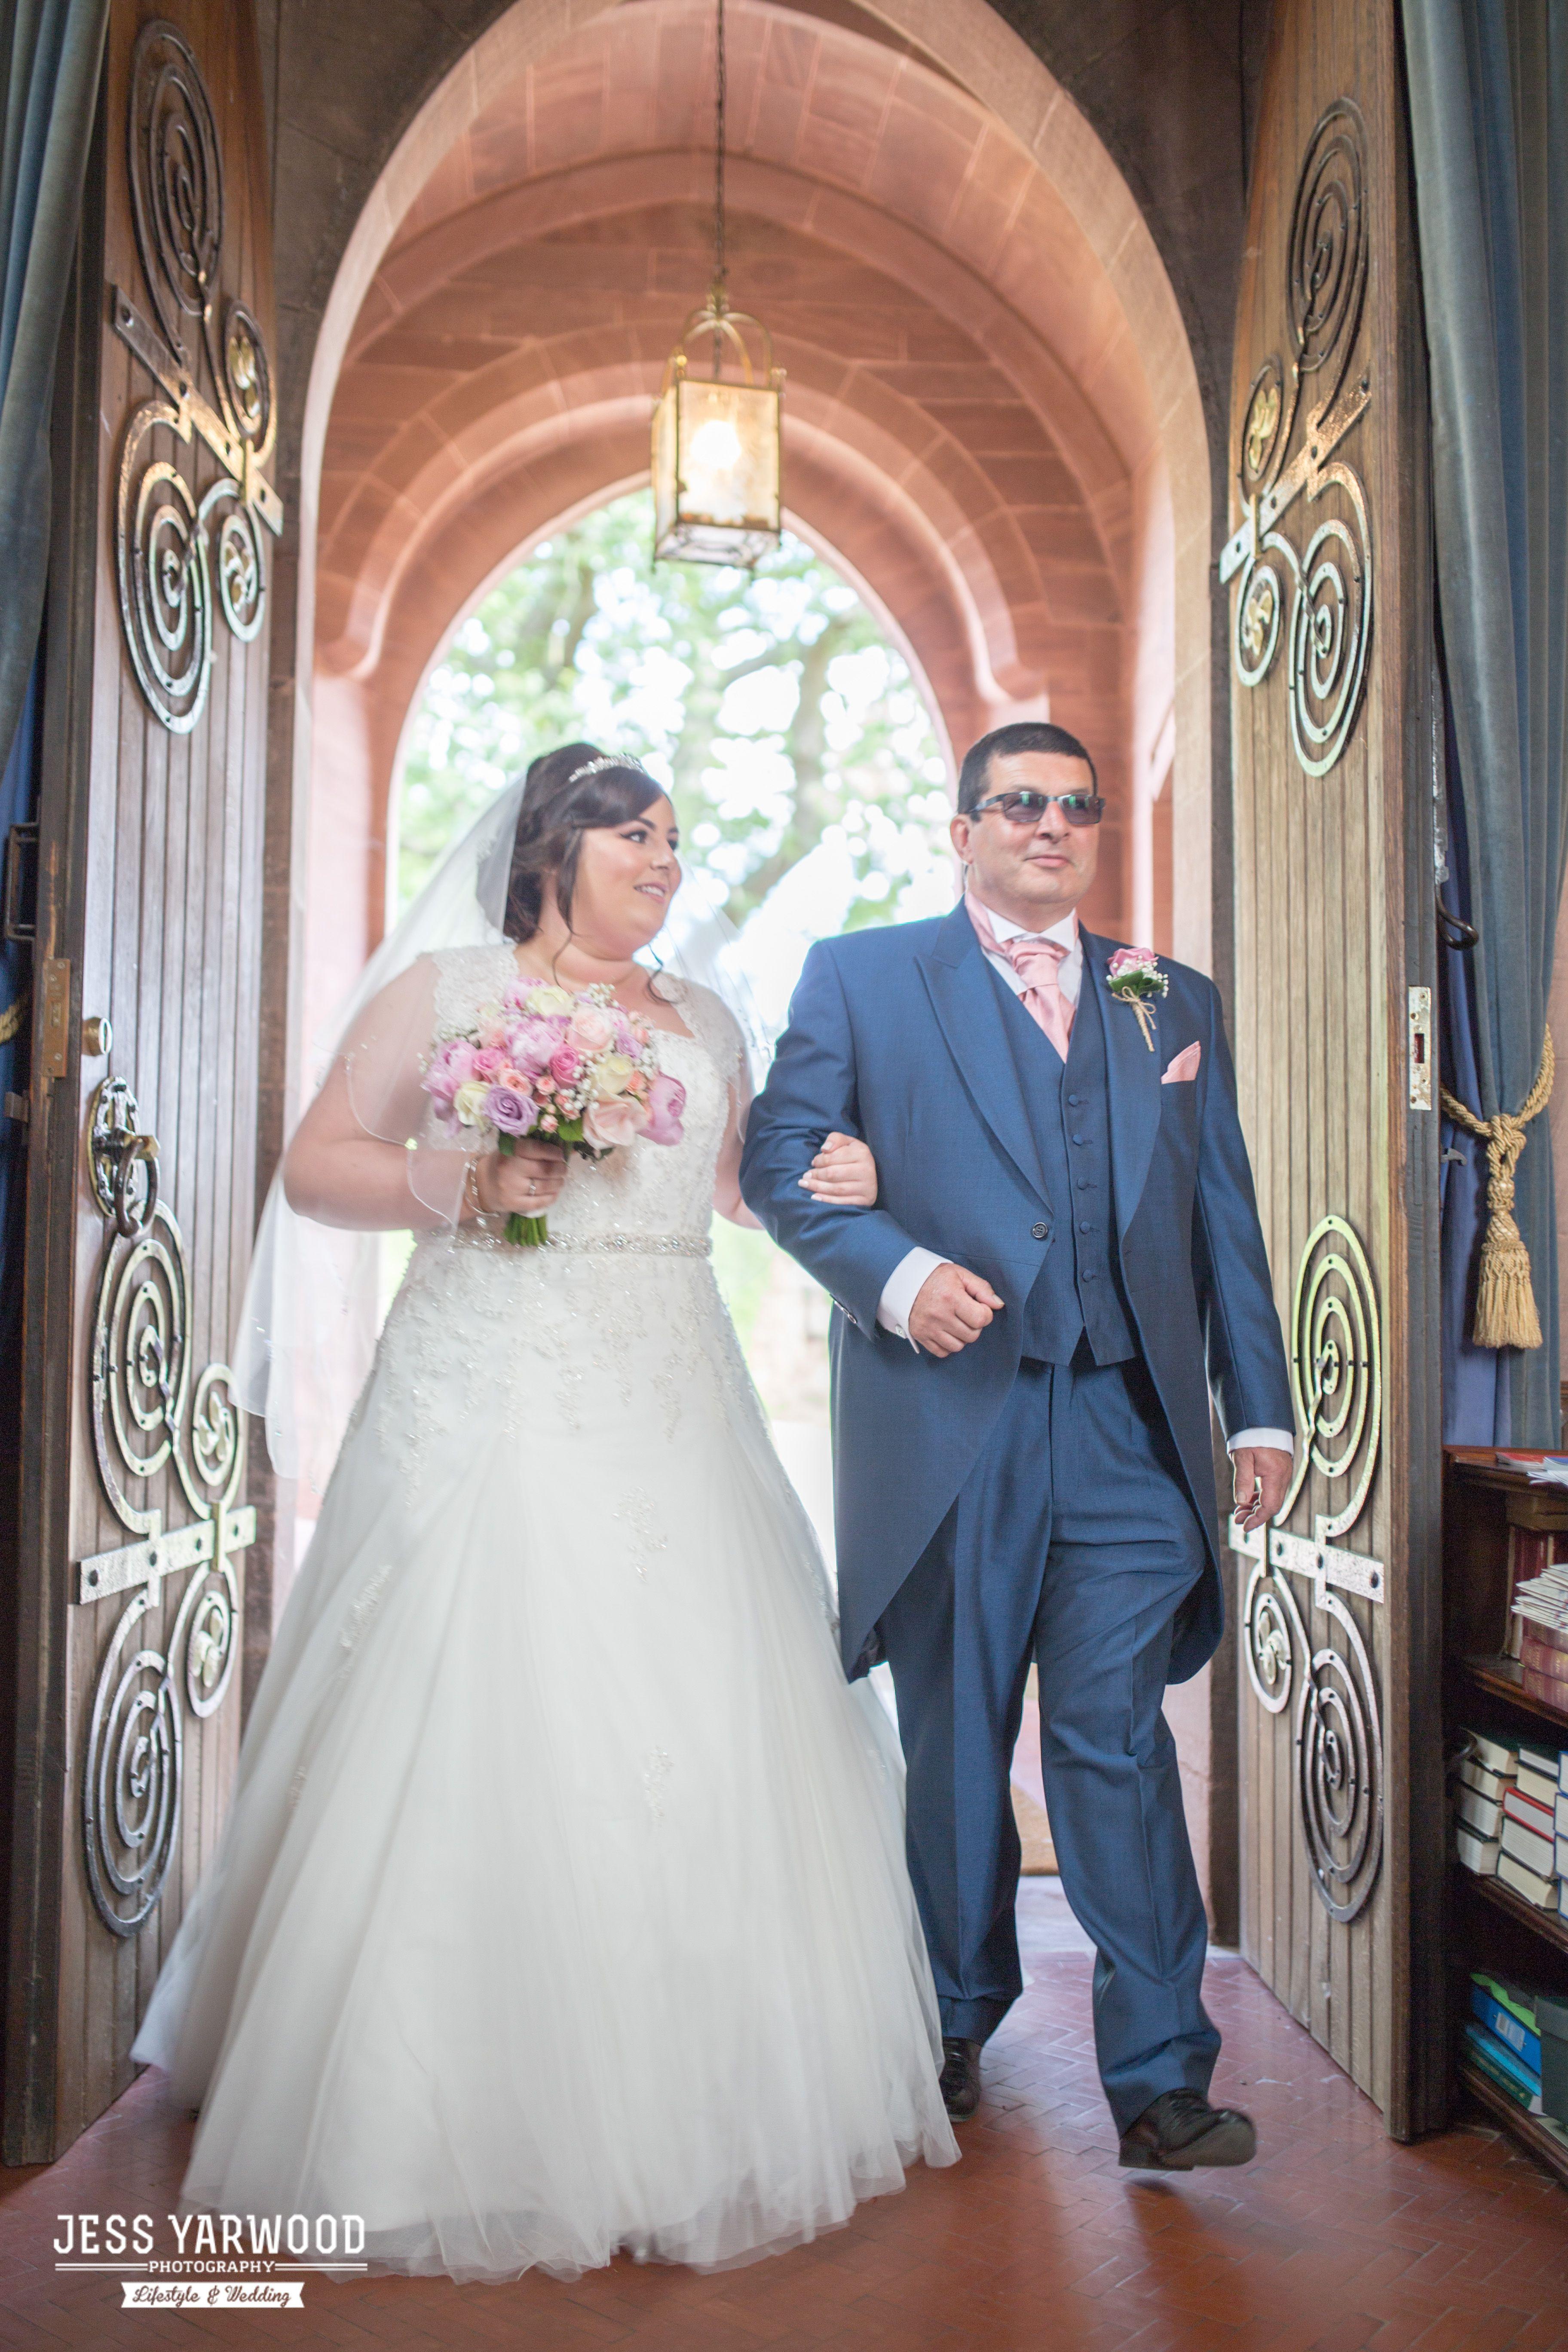 Grosvenor Pulford Chester Wedding Blue Photographer Jess Yarwood father bride